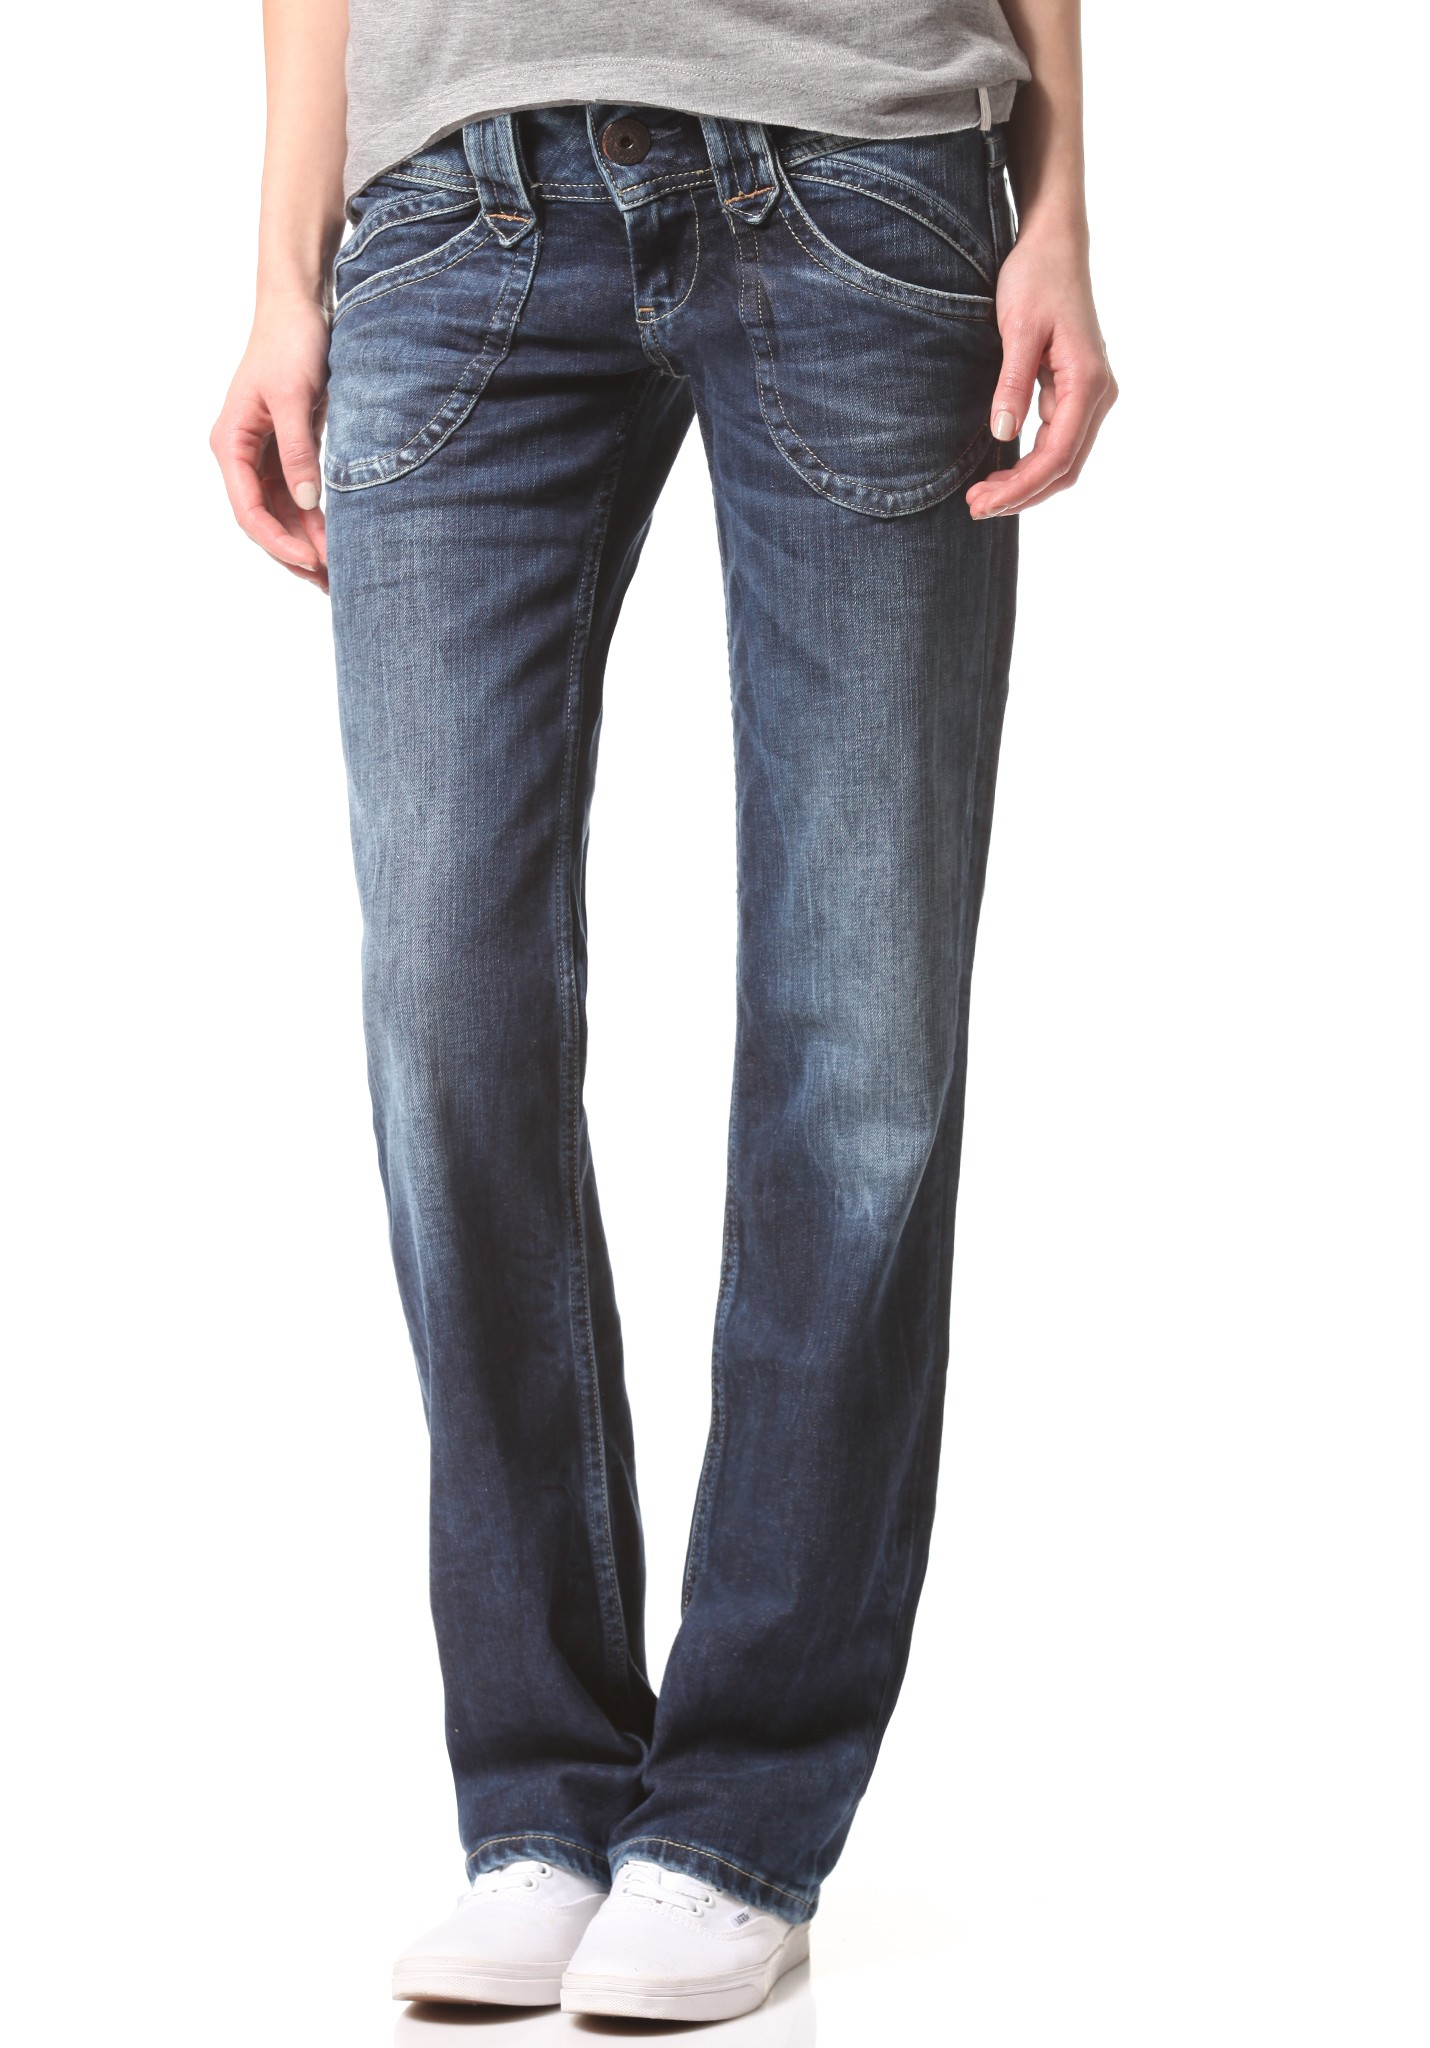 neu pepe jeans midonna damen jeans hose ebay. Black Bedroom Furniture Sets. Home Design Ideas